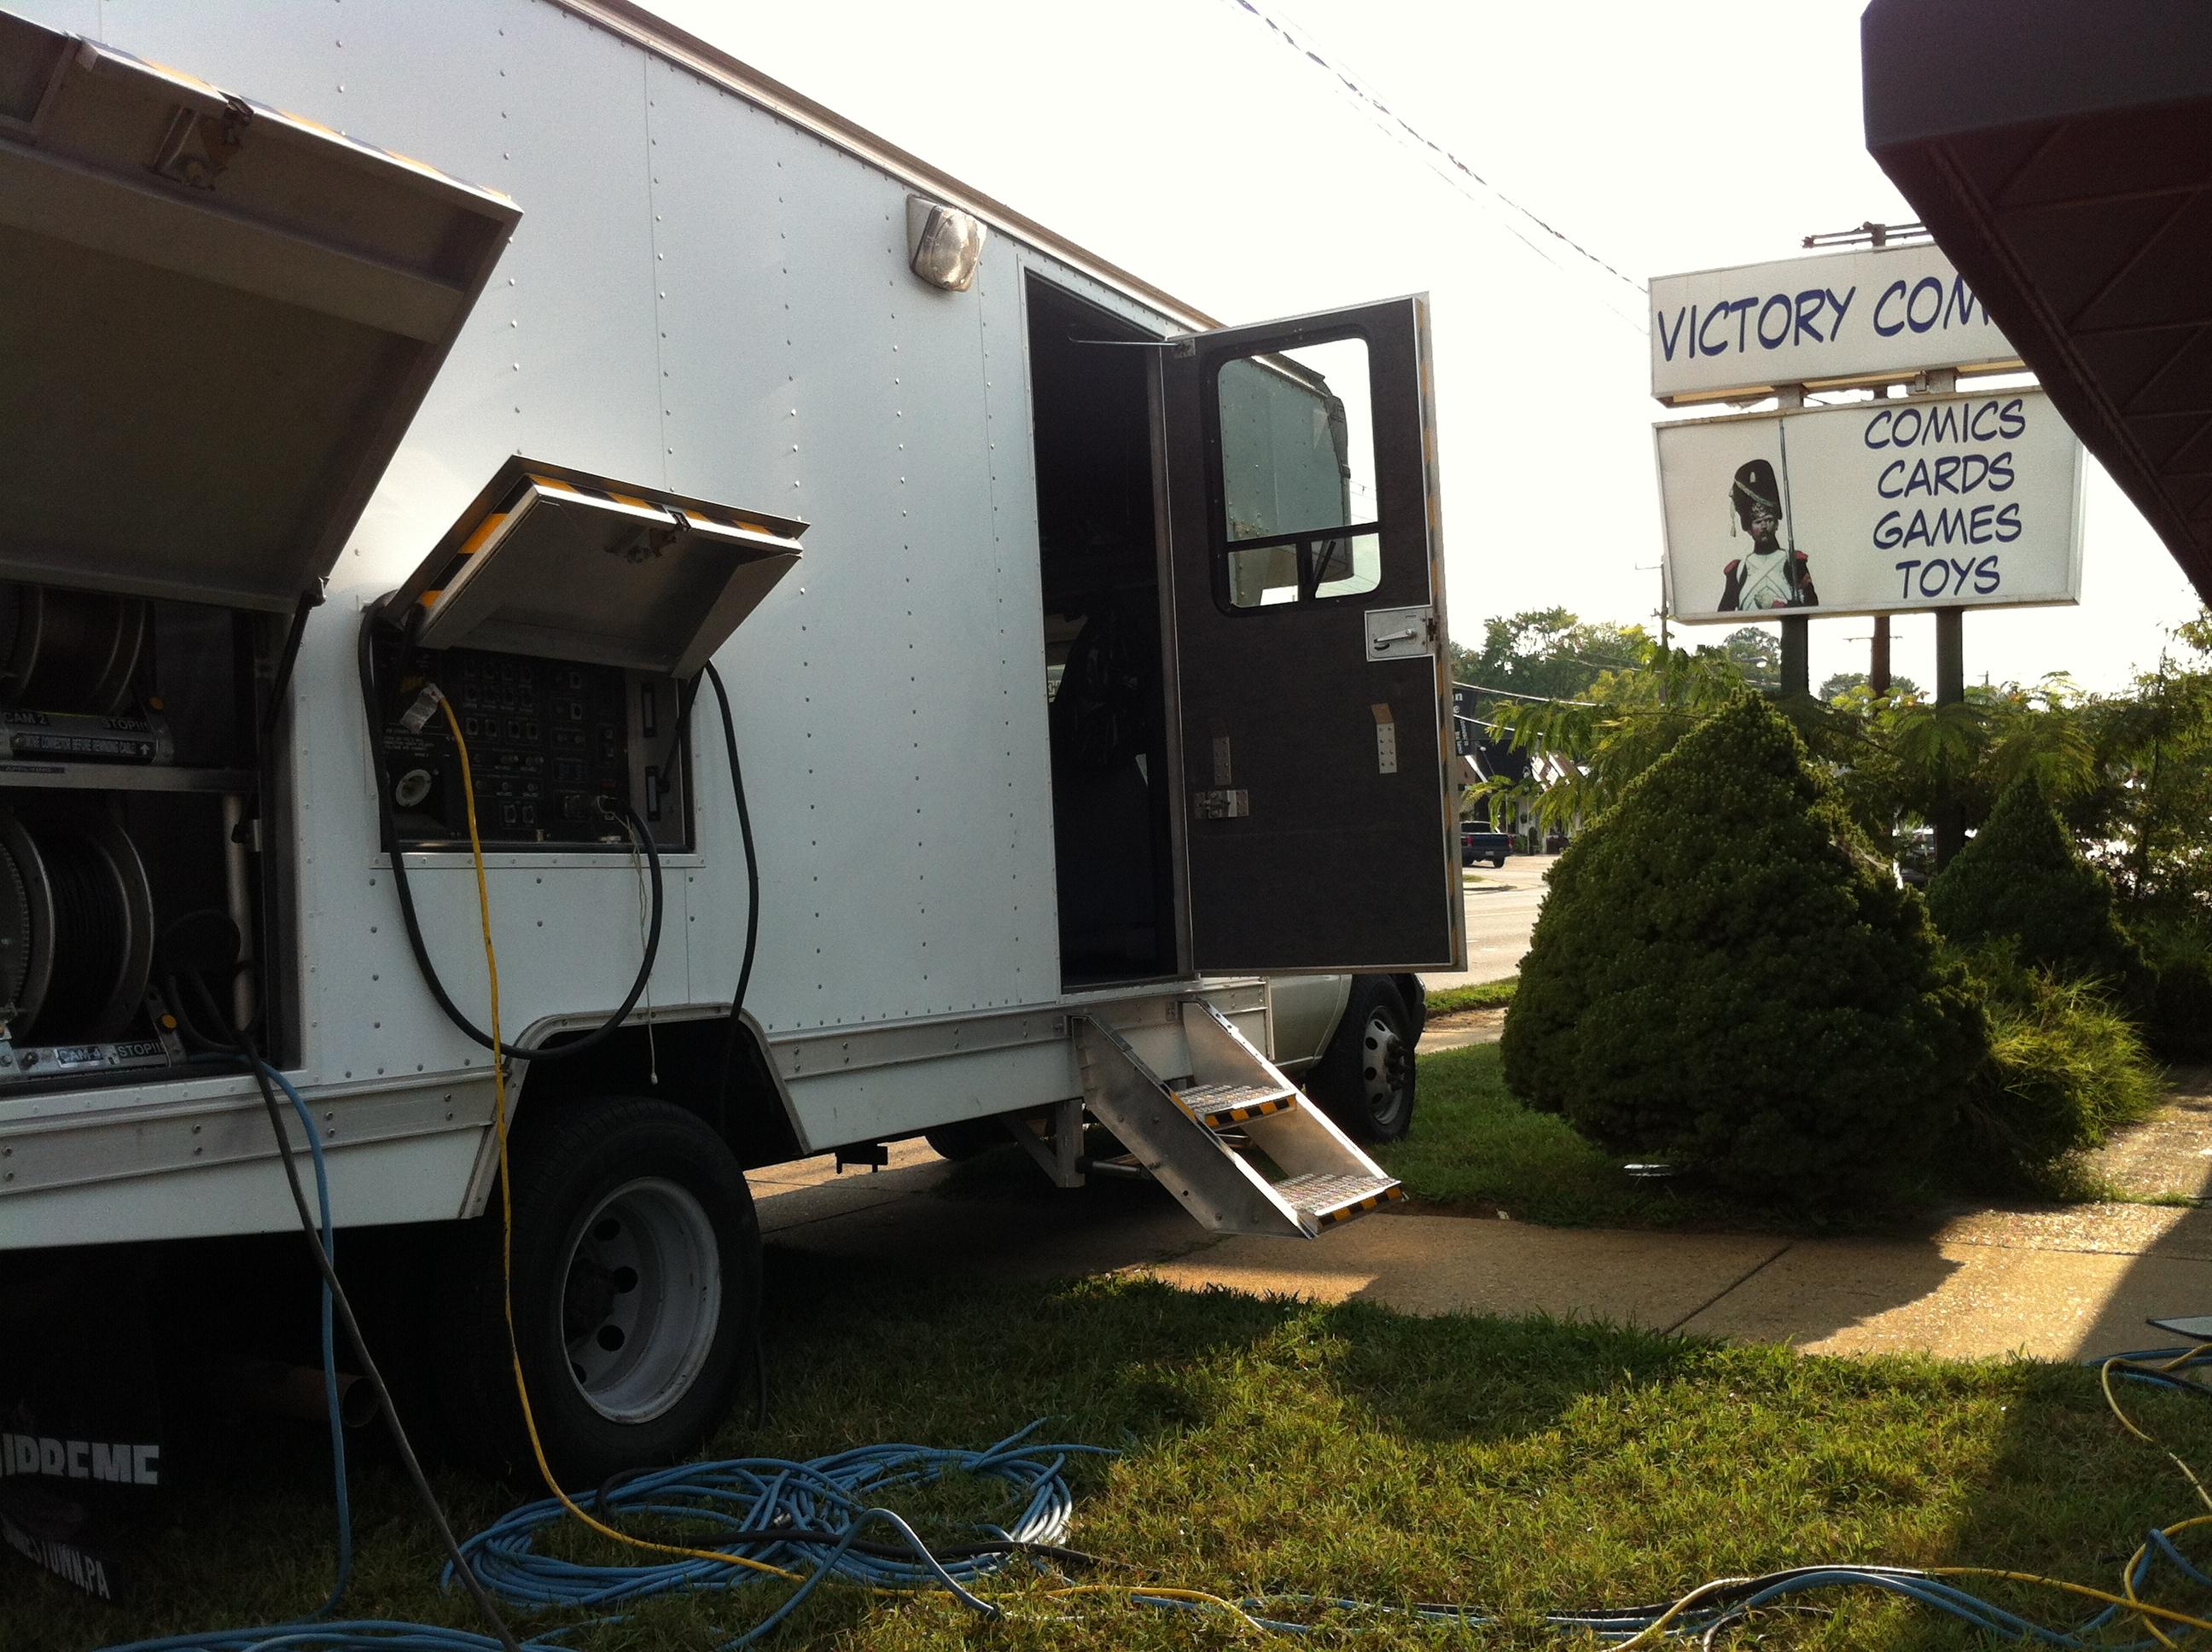 Mobile production van at Victory Comics